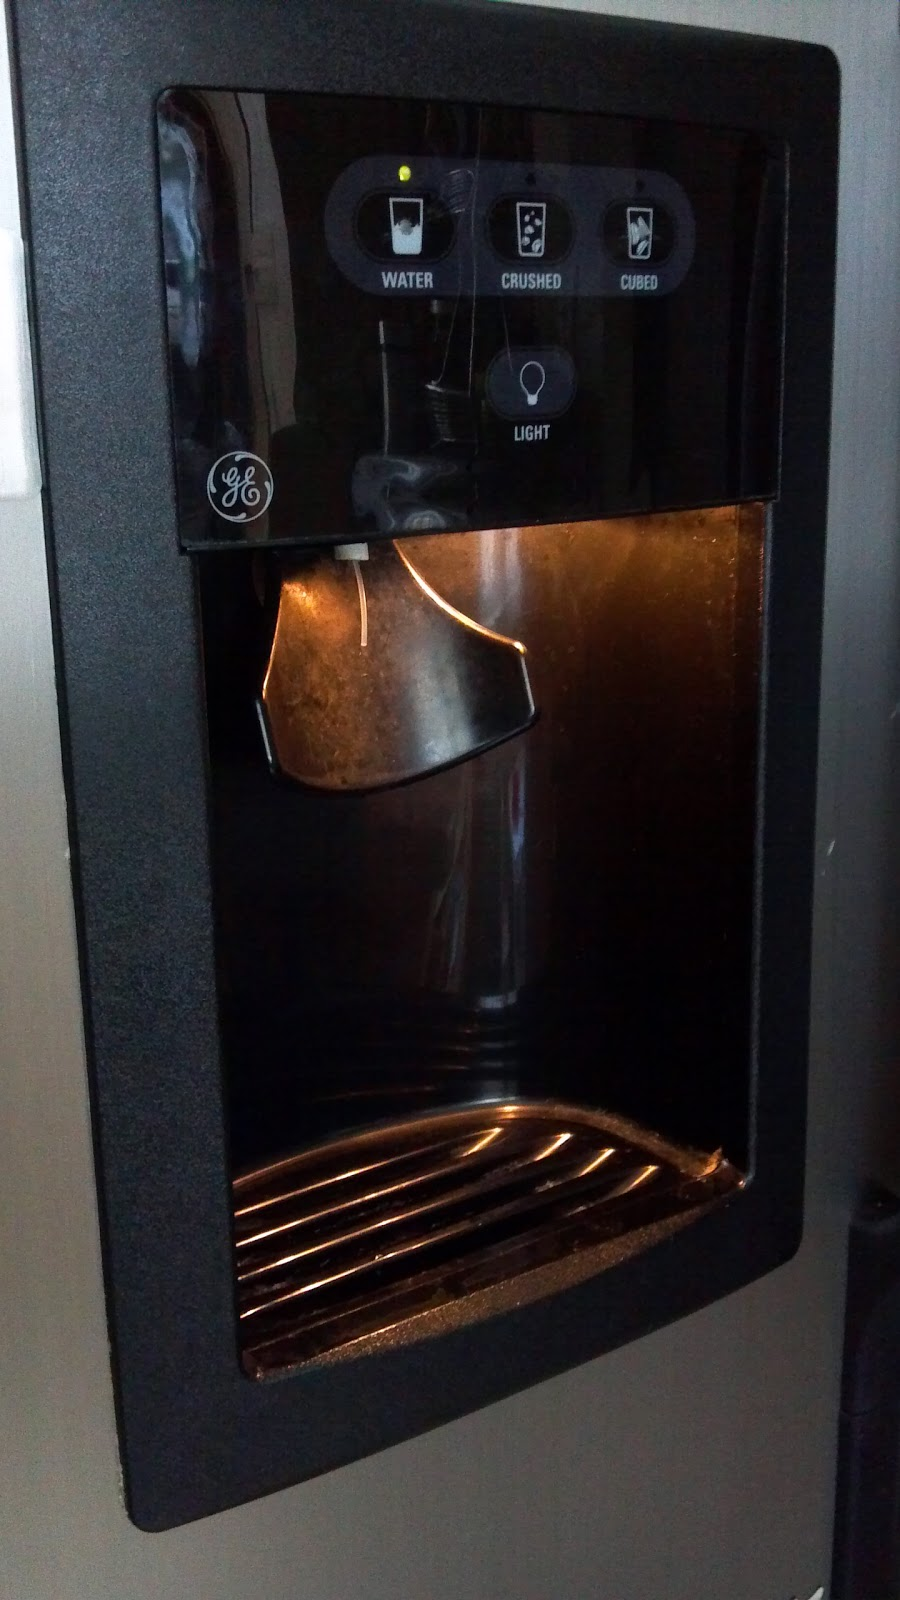 Frozen Refrigerator Freezer Water Dispenser